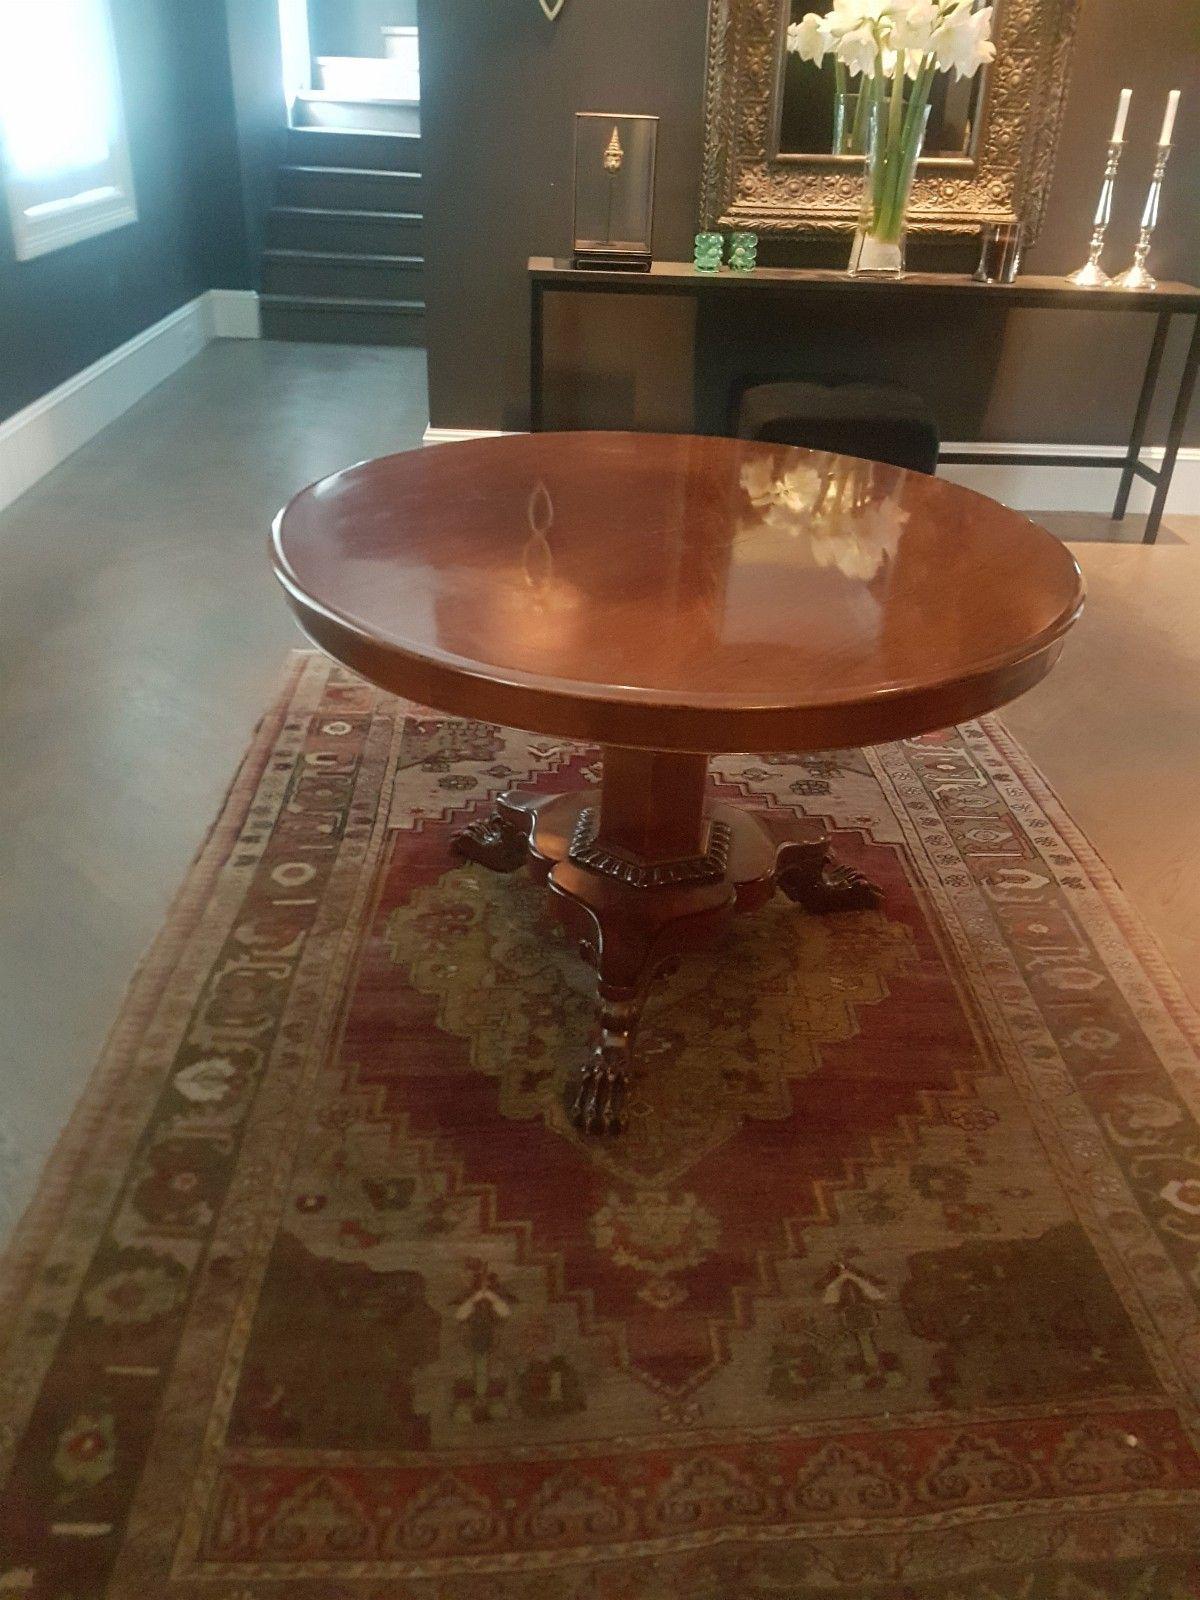 FINN – Rundt bord